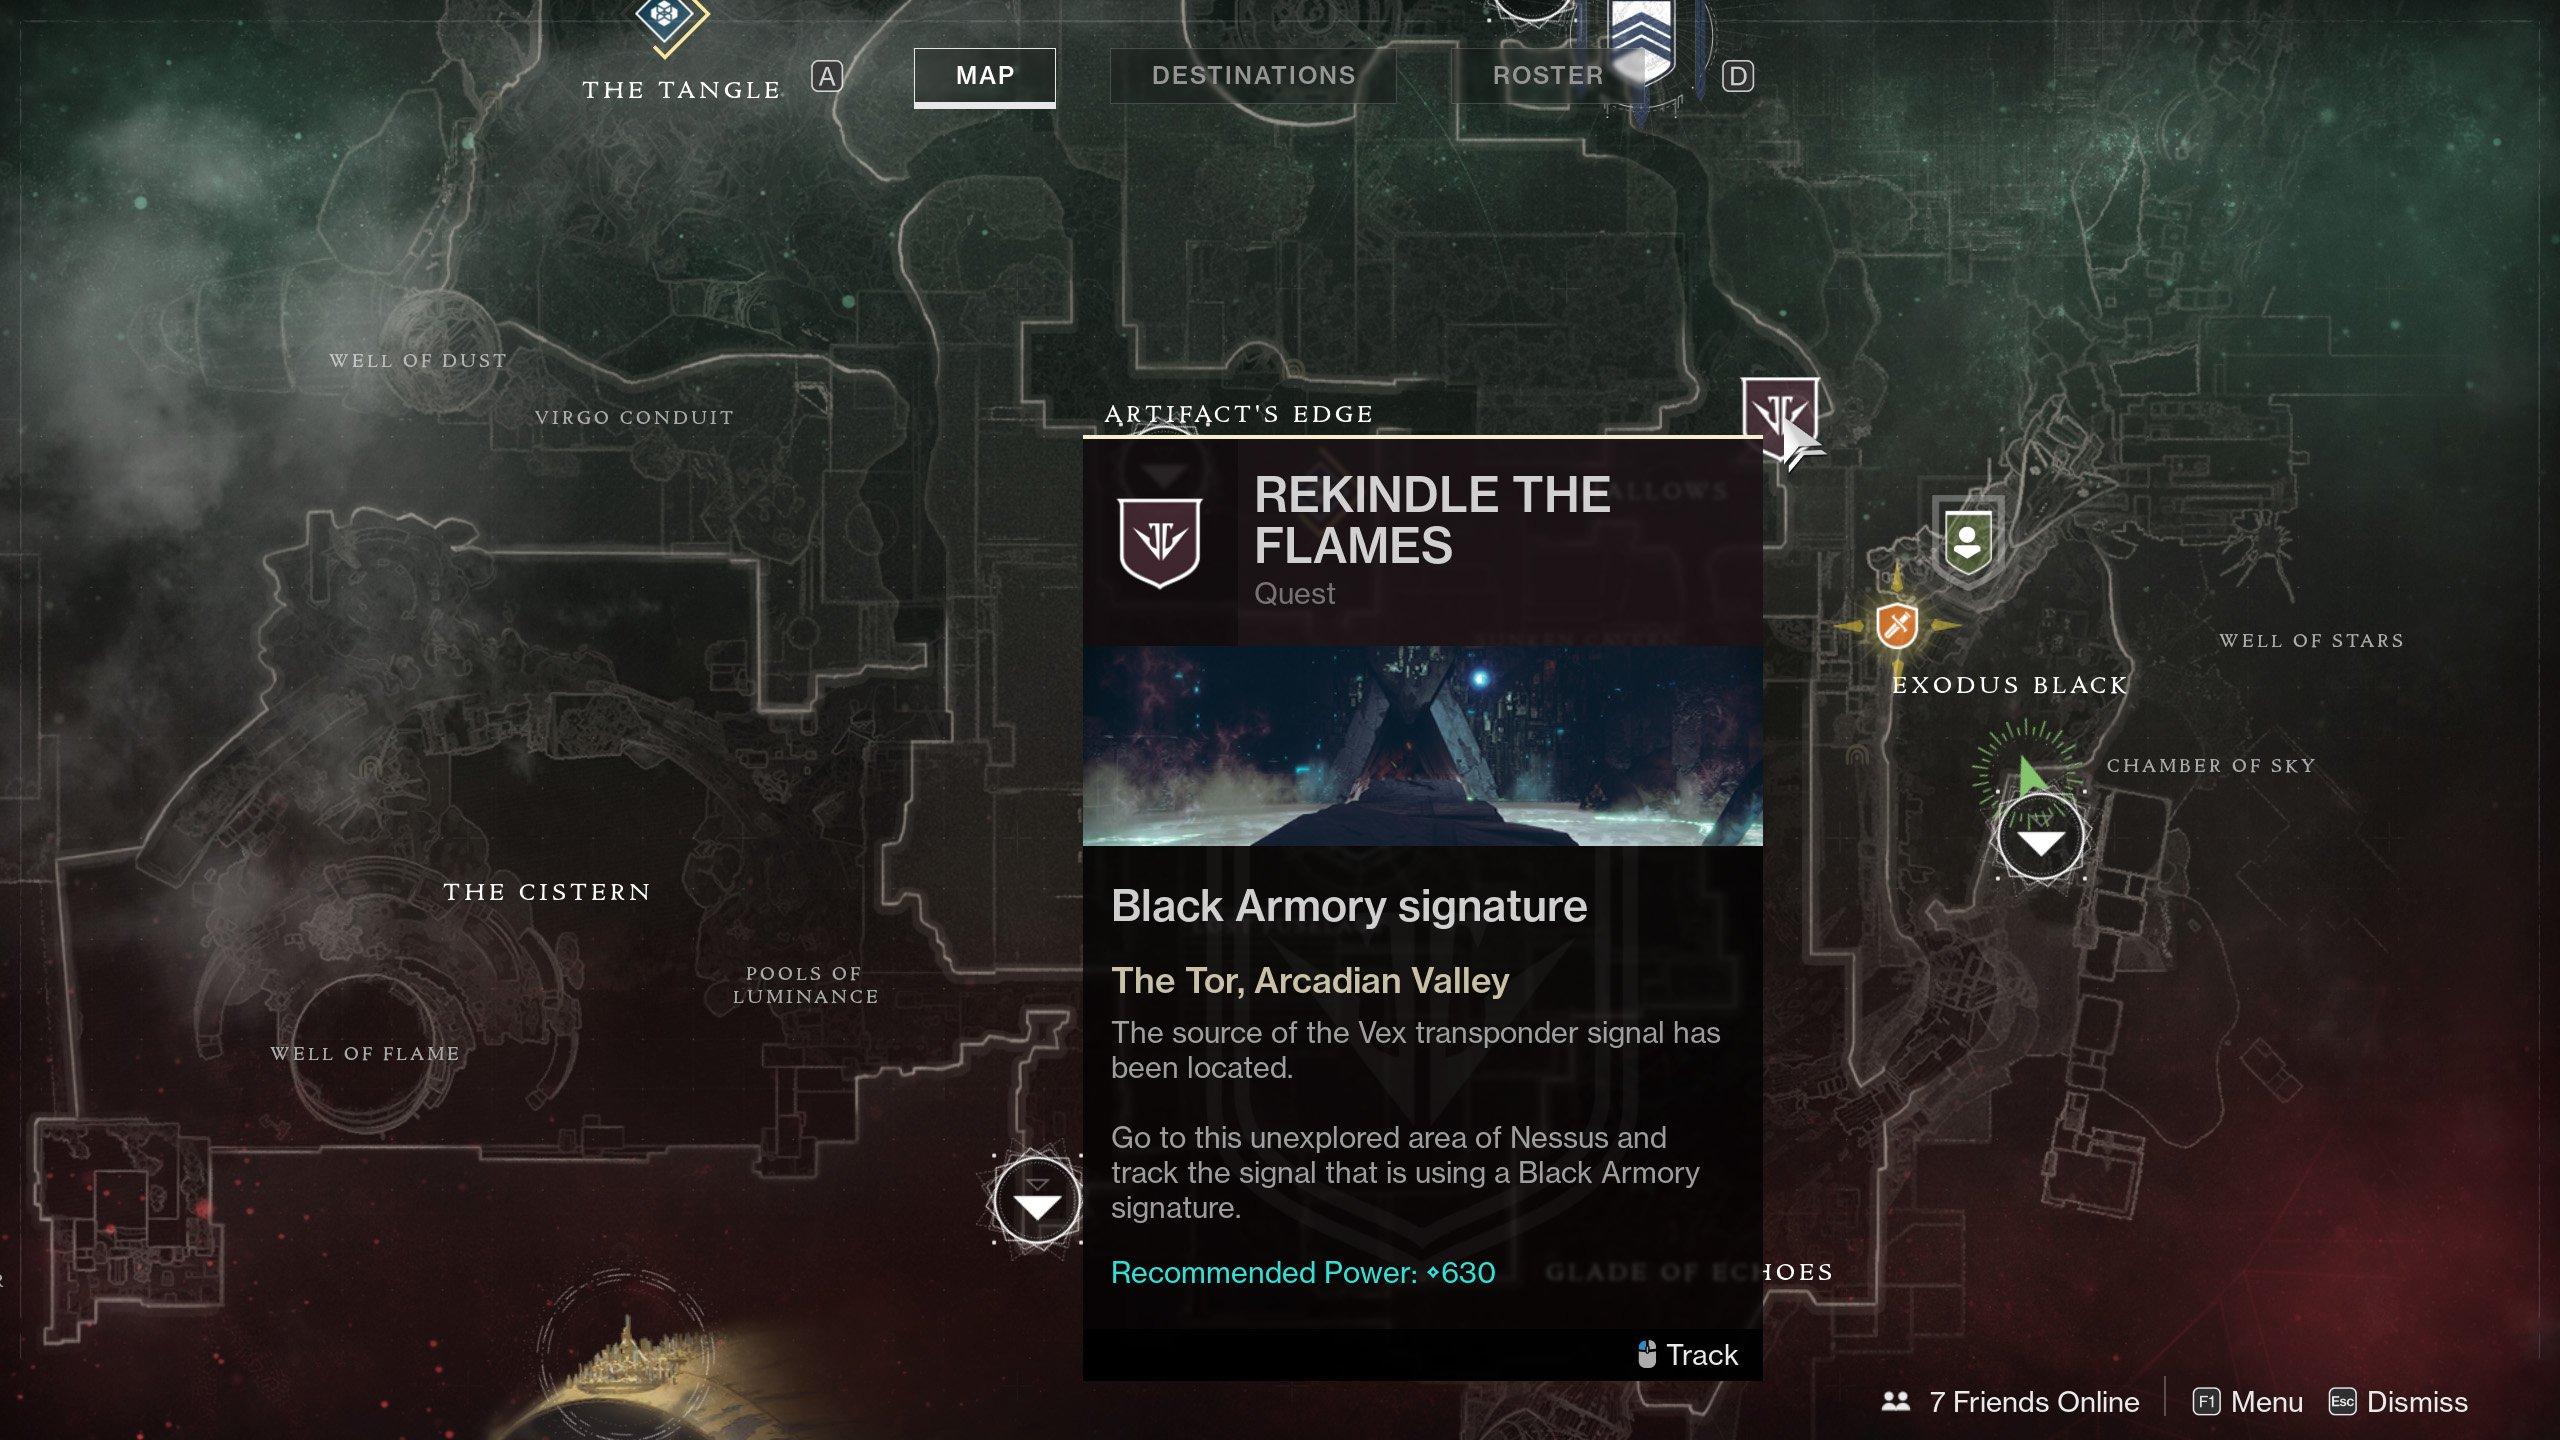 Rekindle the Flames Mission Izanami Forge Destiny 2